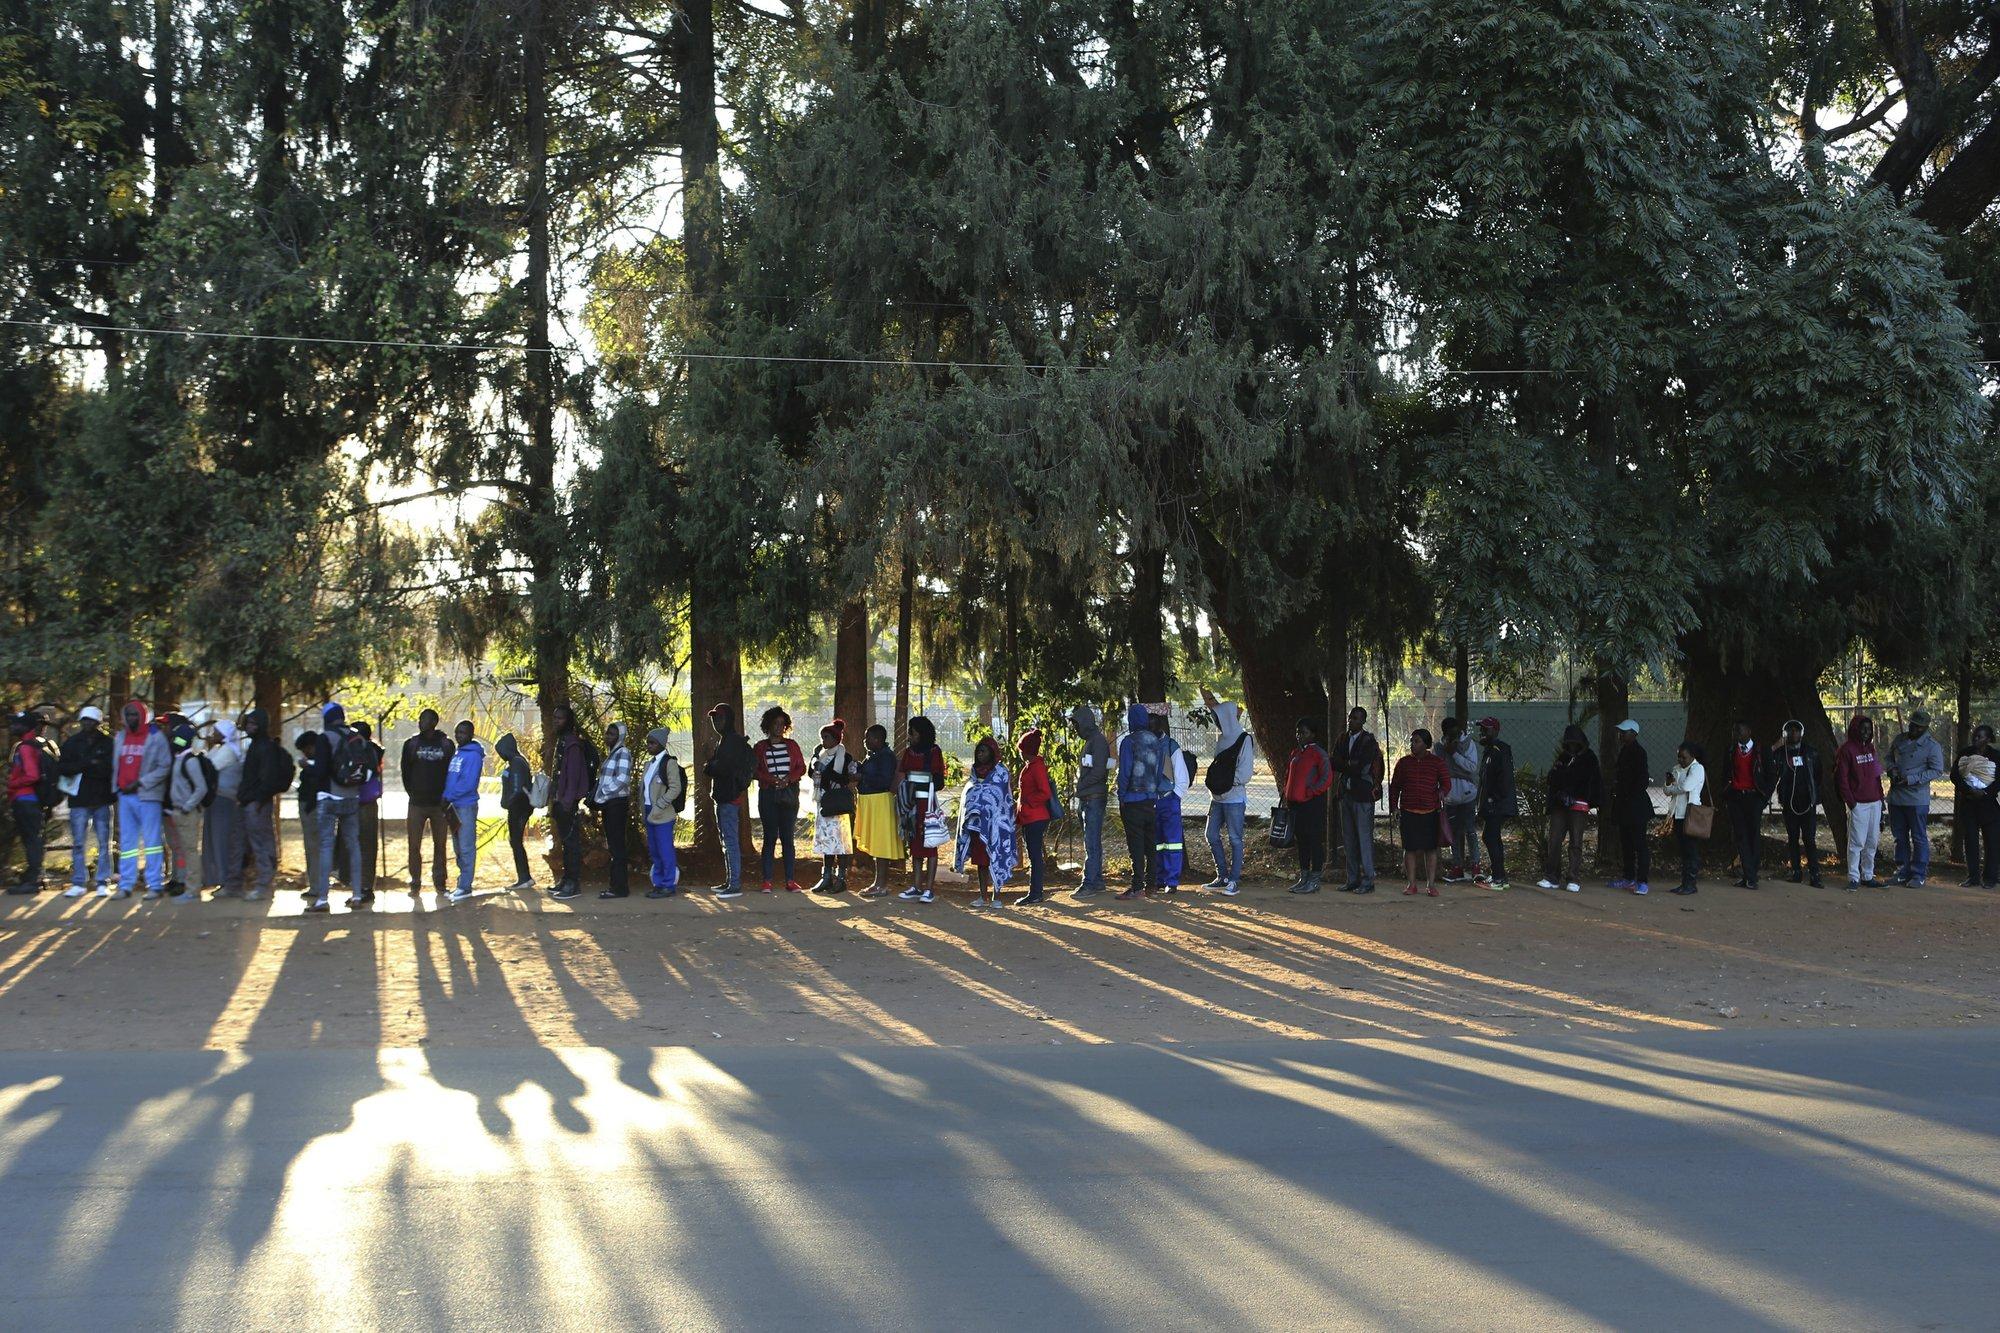 Many Zimbabweans desperate to escape turmoil, but dreams end